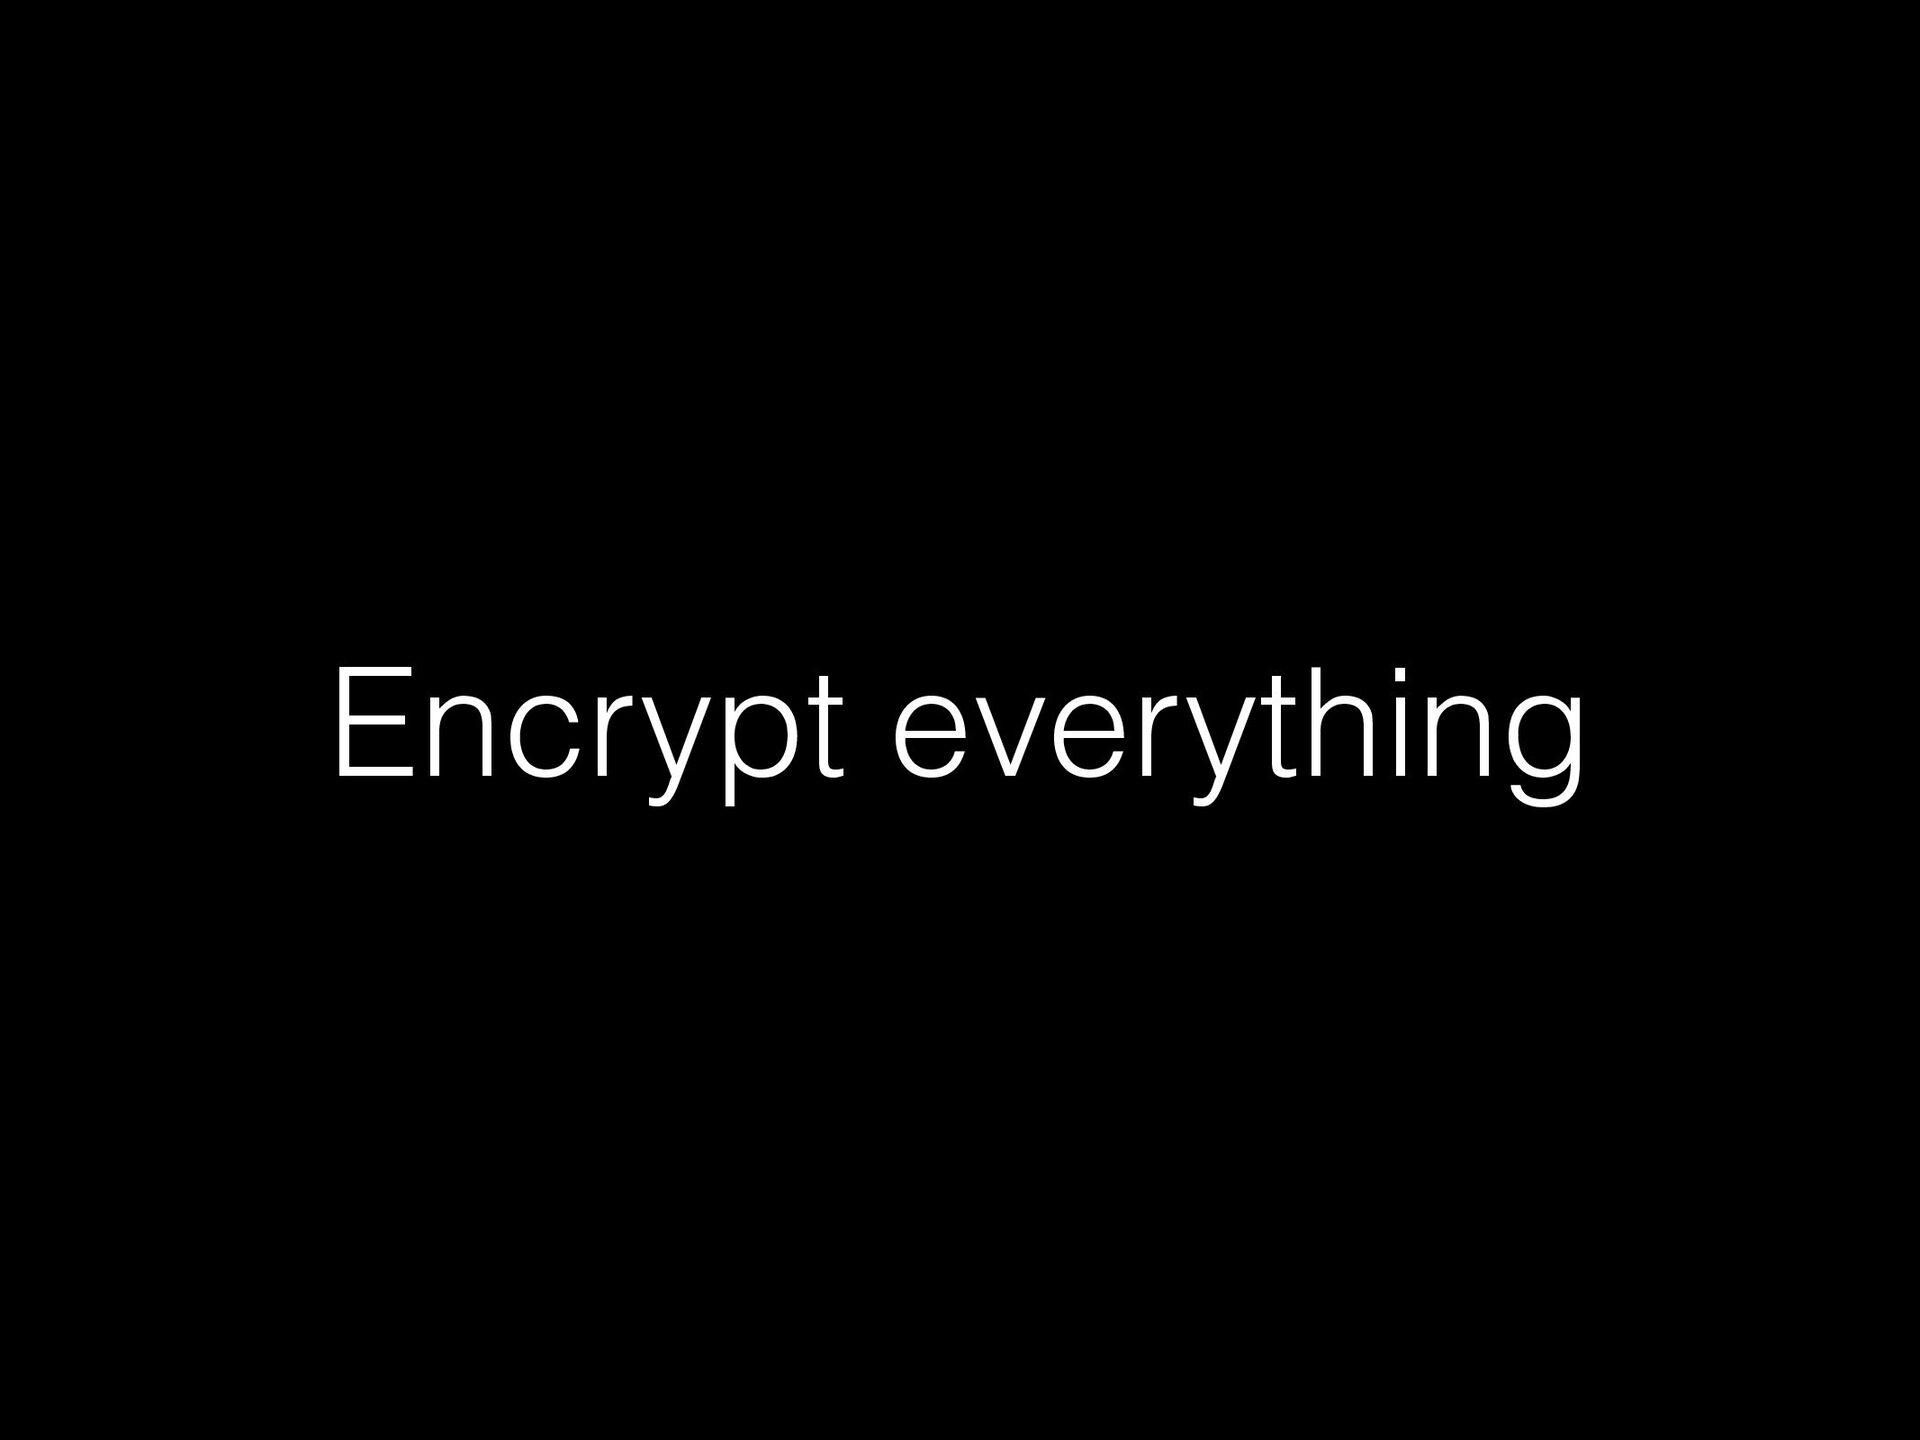 Cover Your Cameras